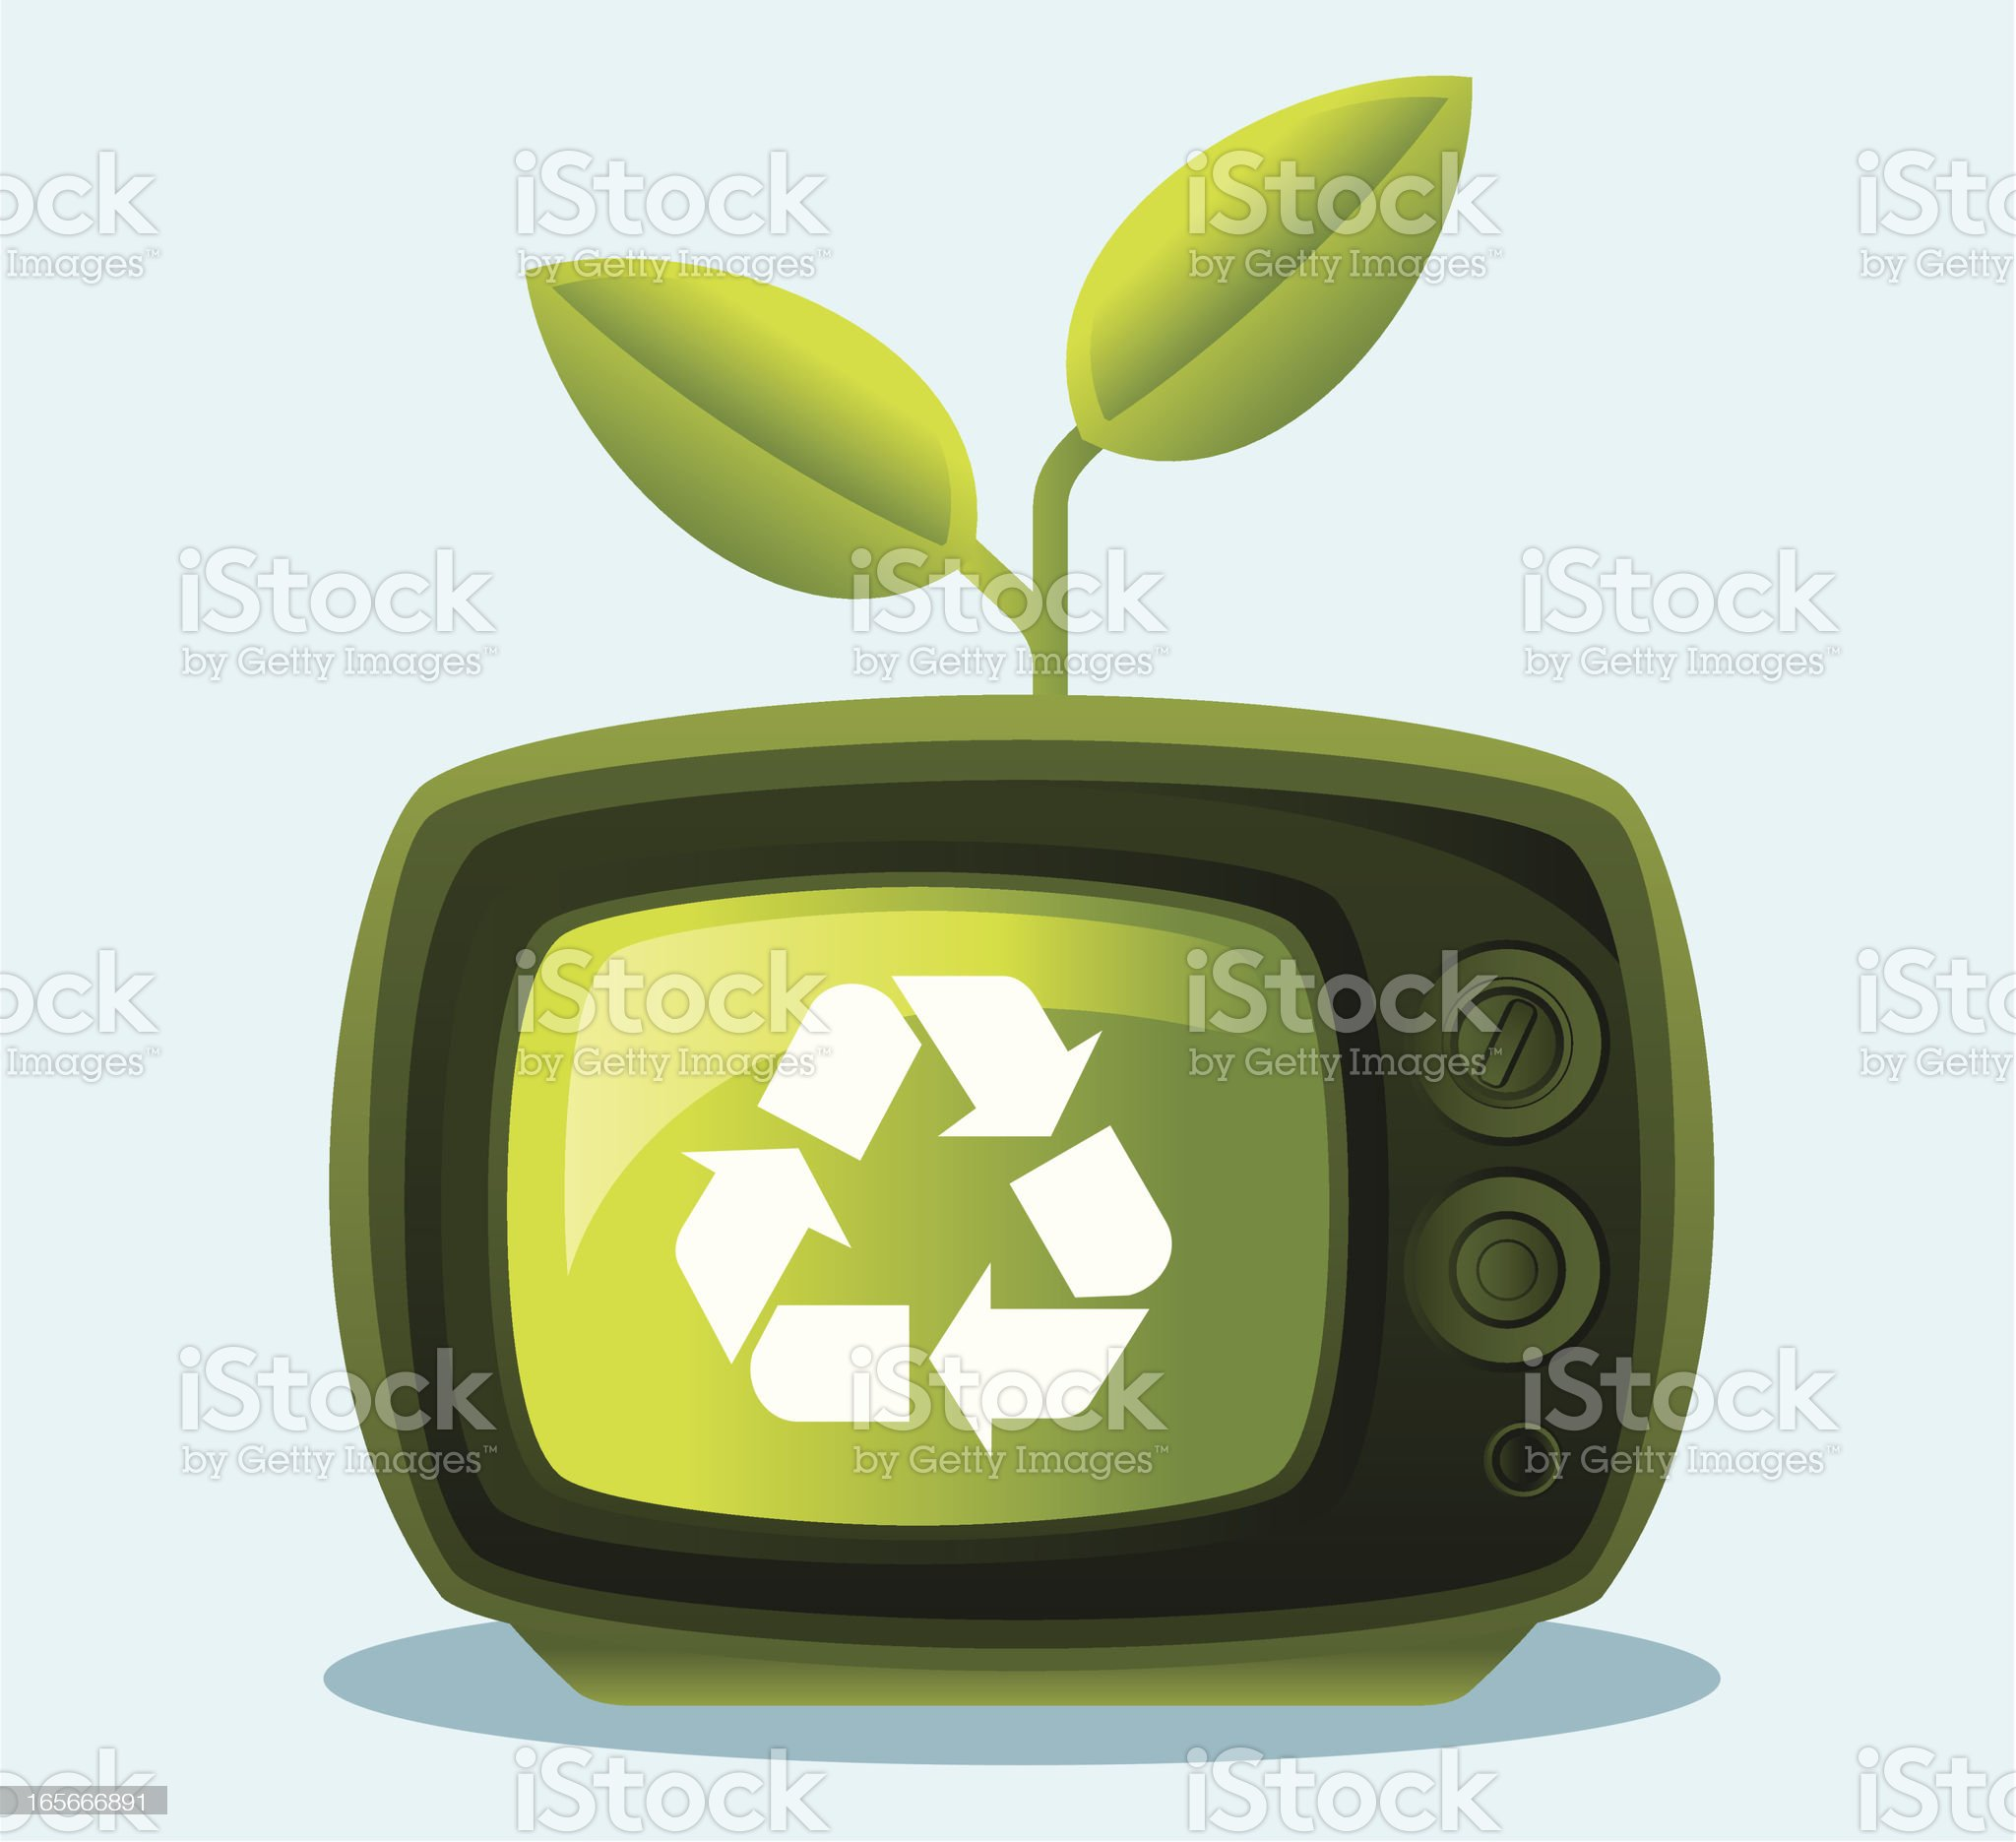 Green Information royalty-free stock vector art